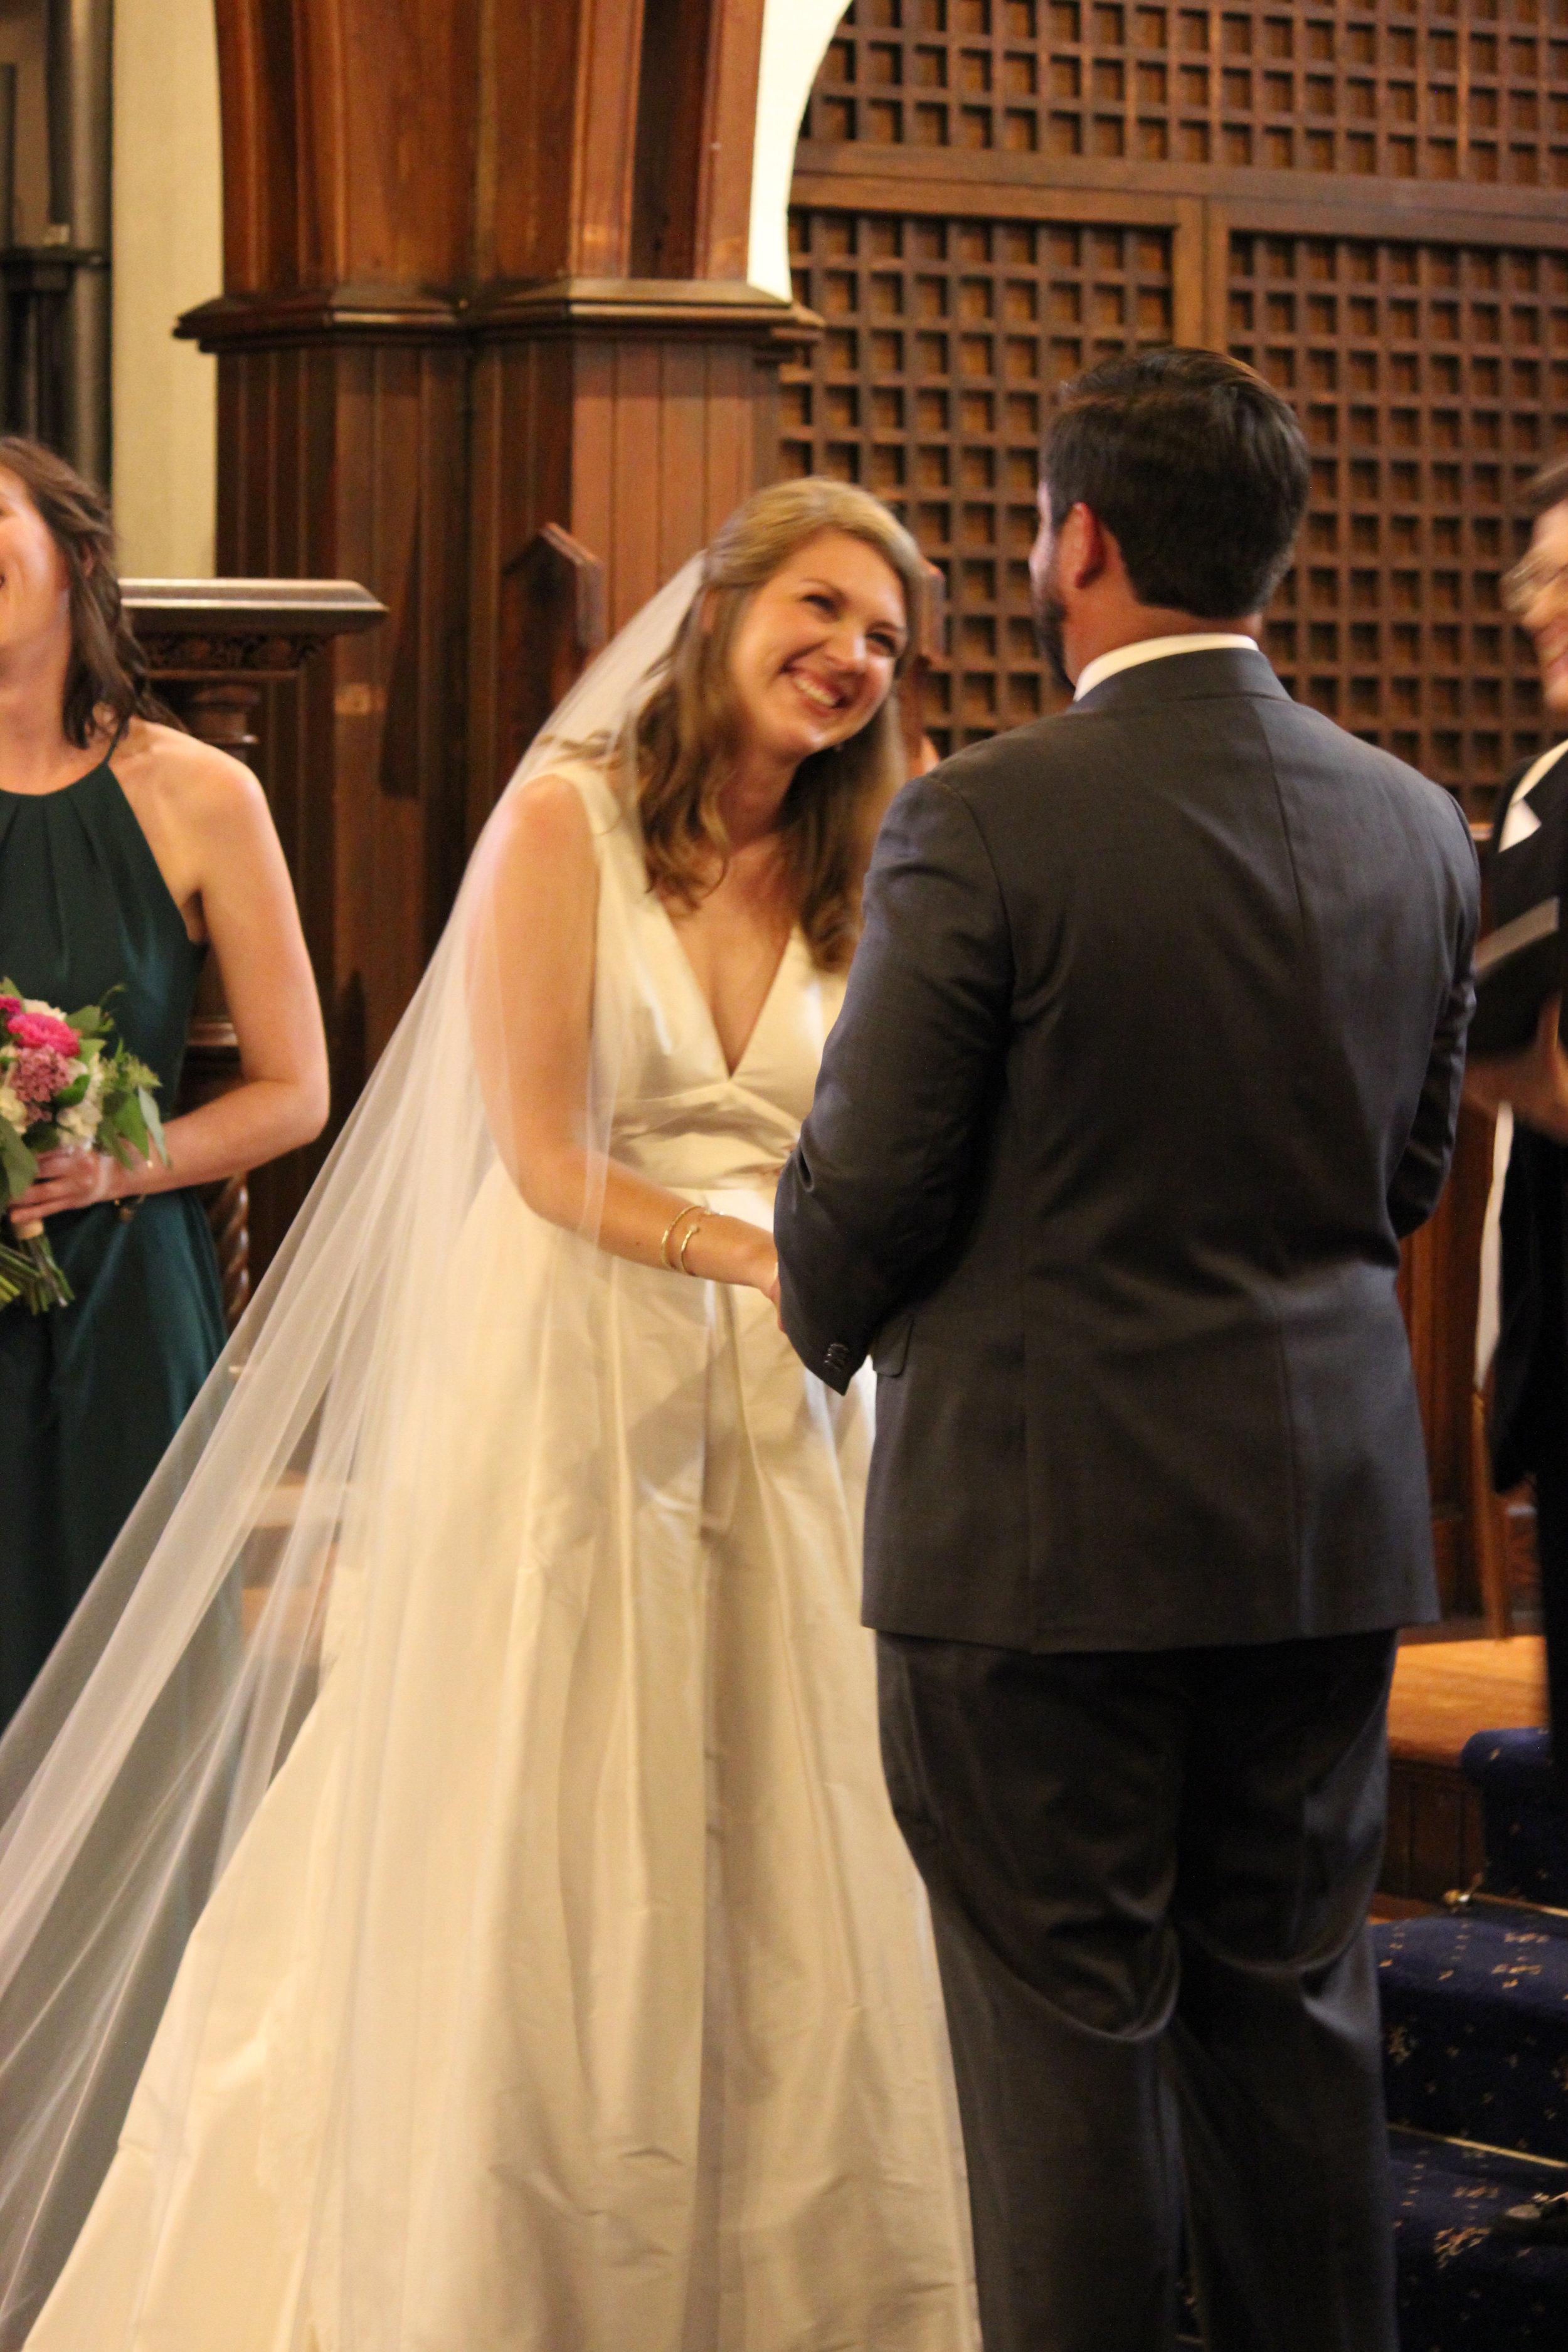 Wedding joy!